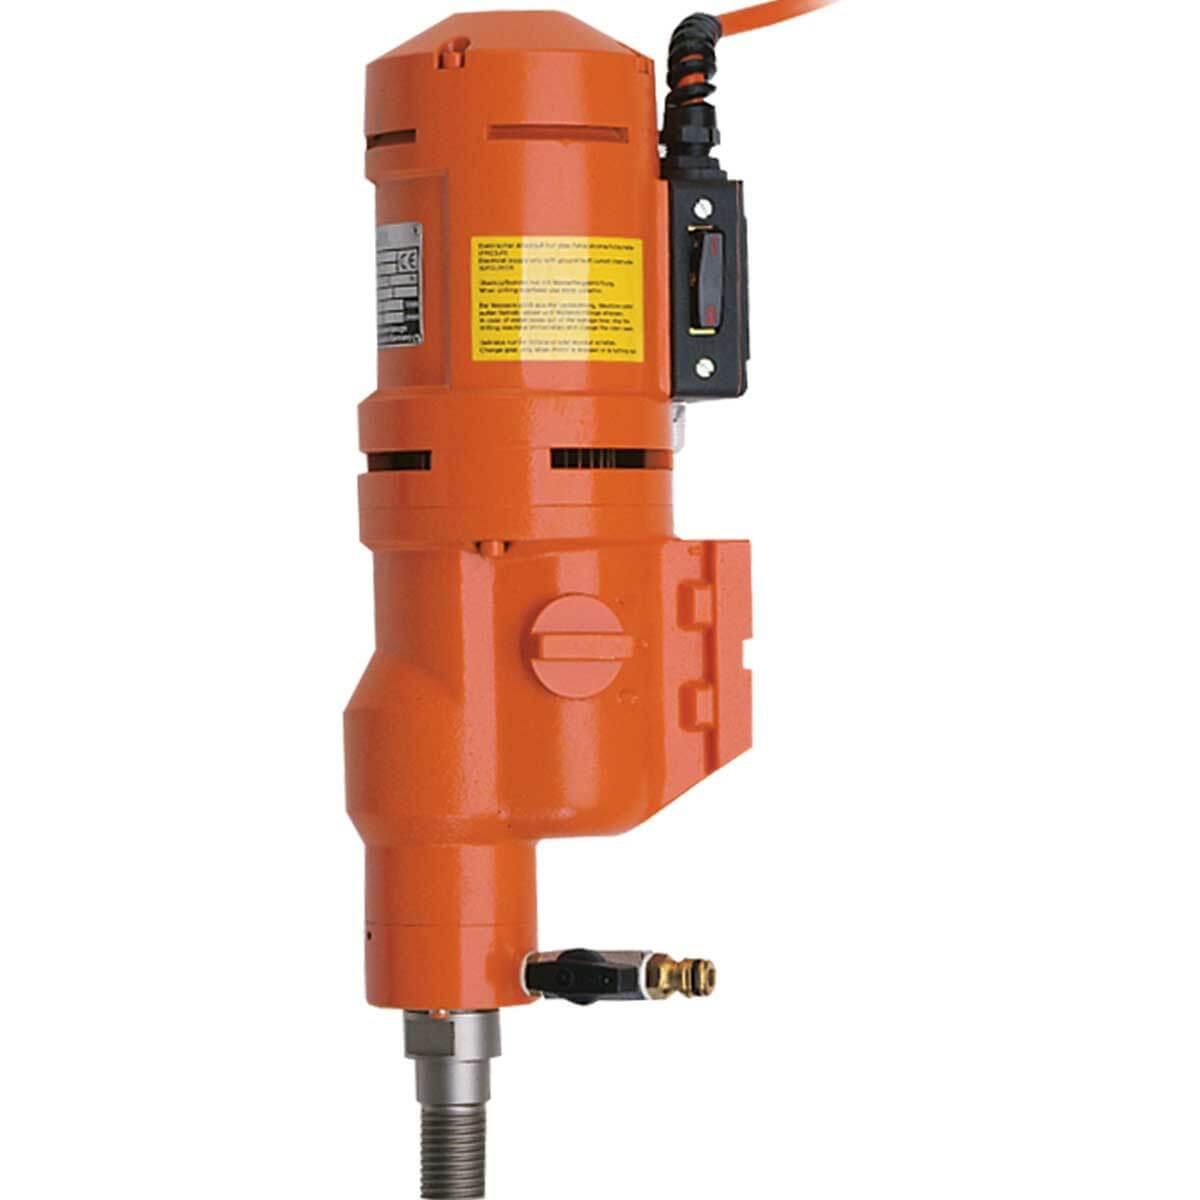 Core Bore Weka DK22 Wet Core Drill